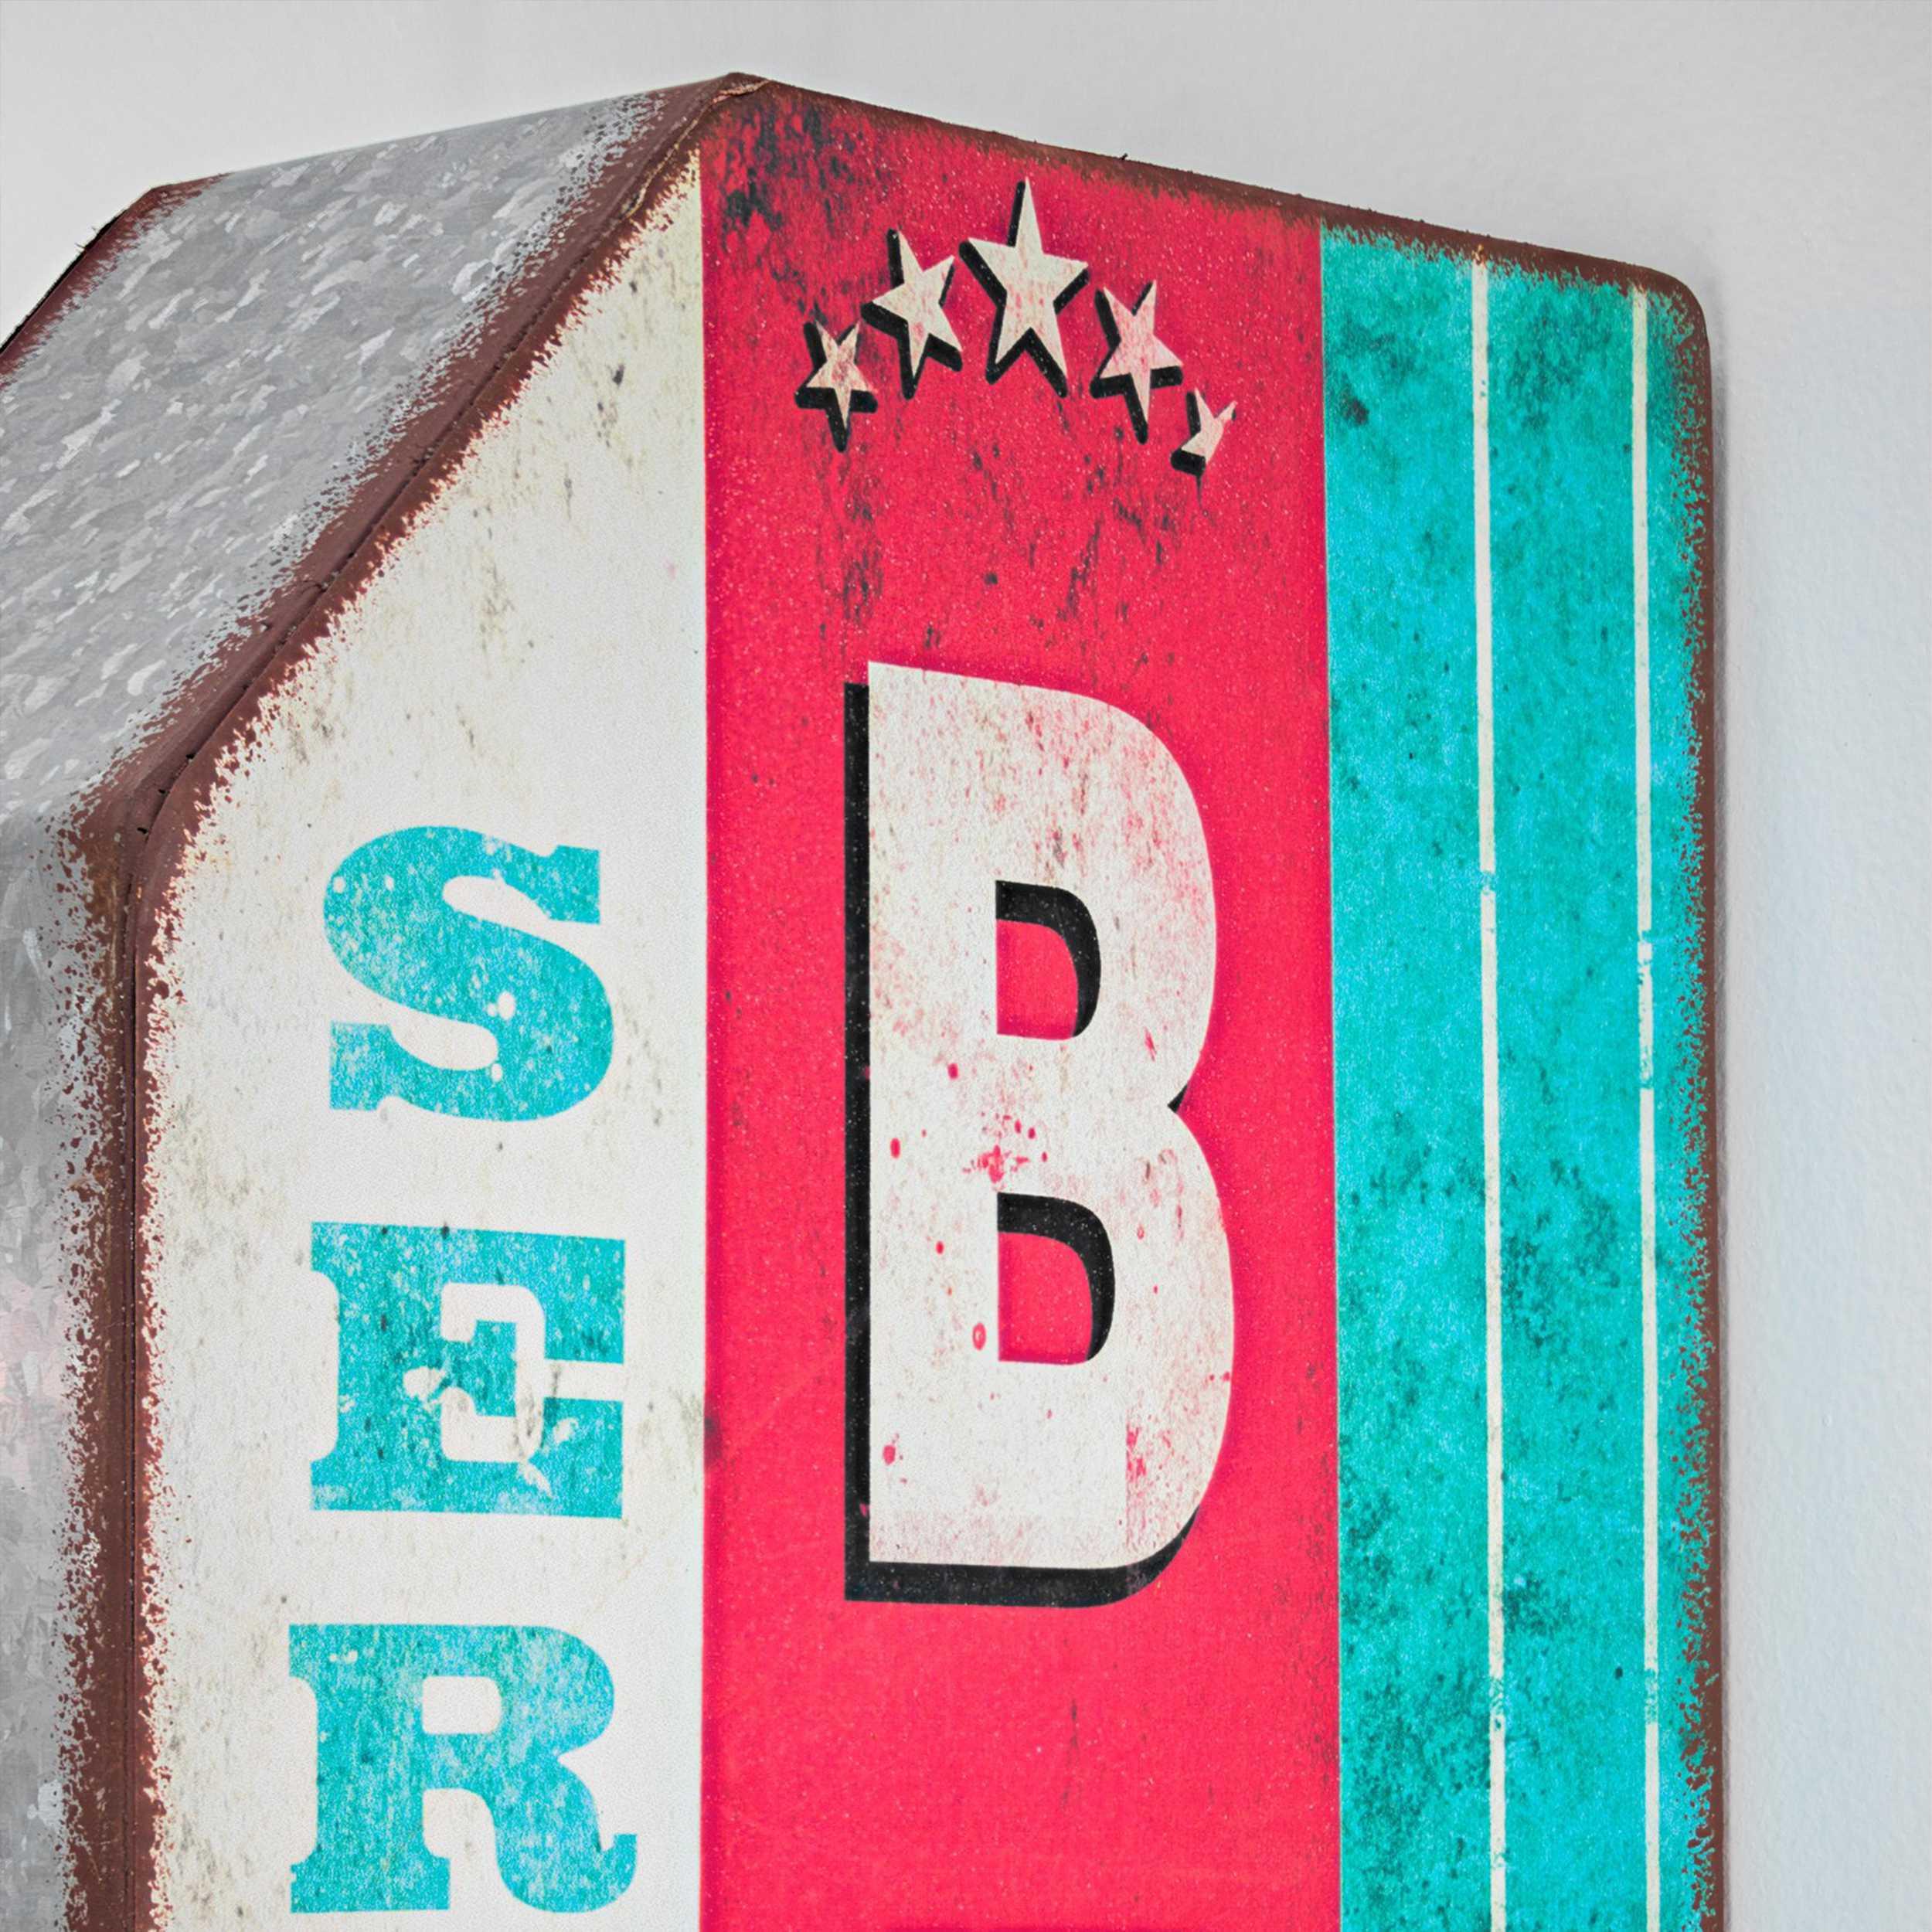 Vintage Two Sided Led Sign - Beer on Draft